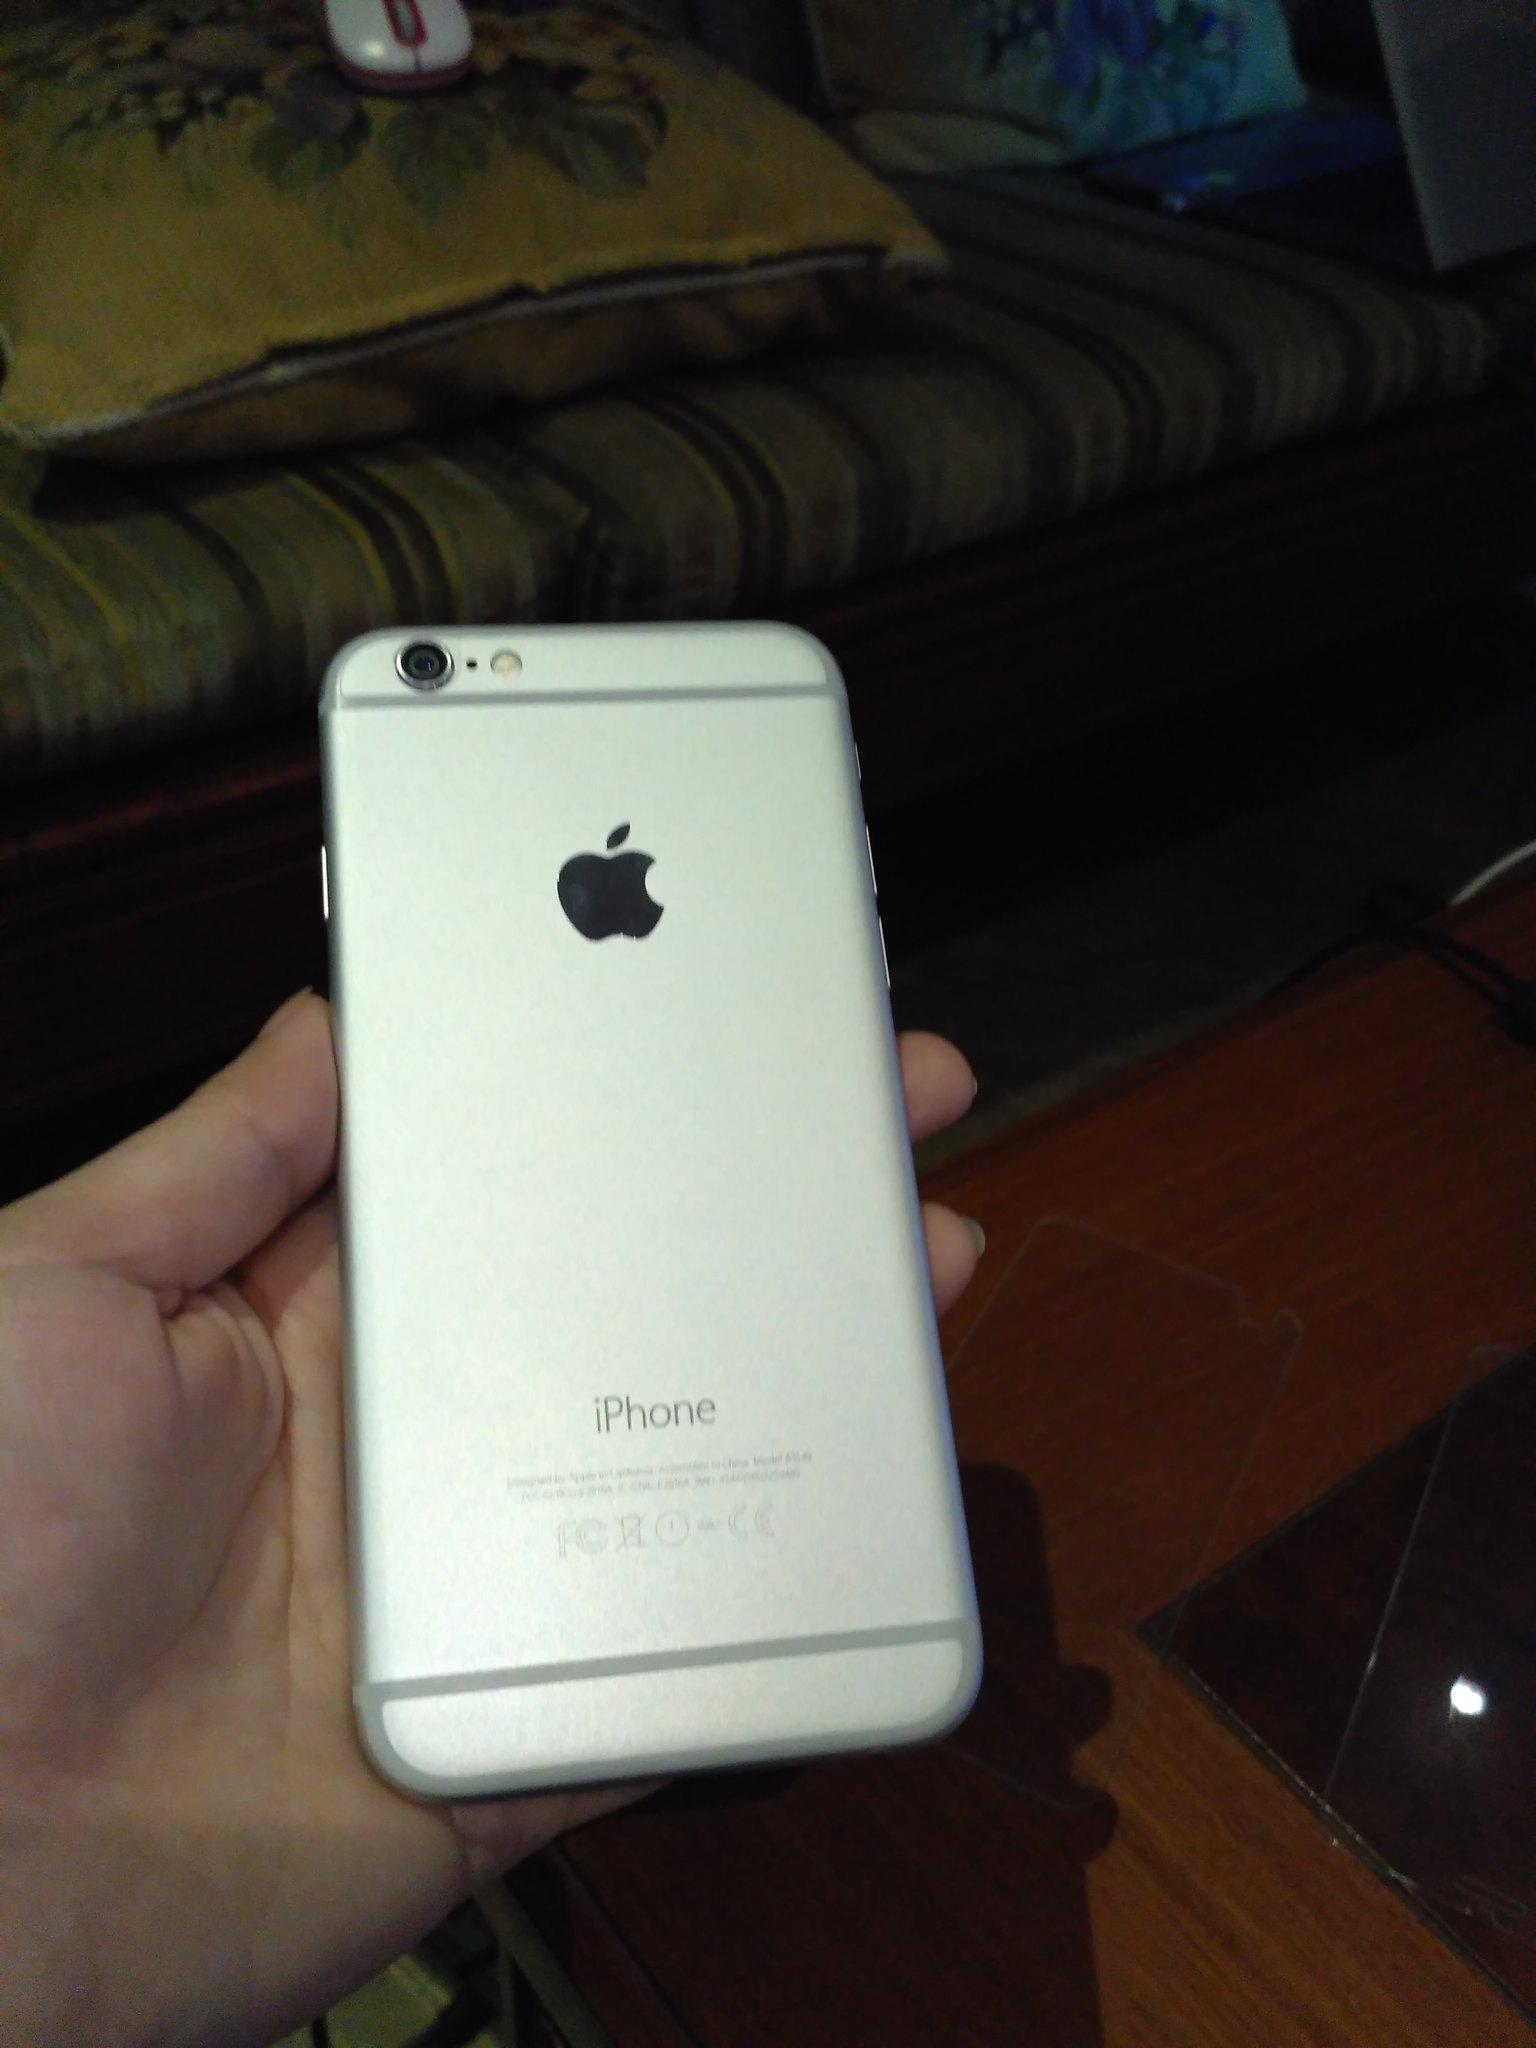 iPhone 6 64GB Silver Quốc tế, fullbox, máy đẹp, giá tốt - 1